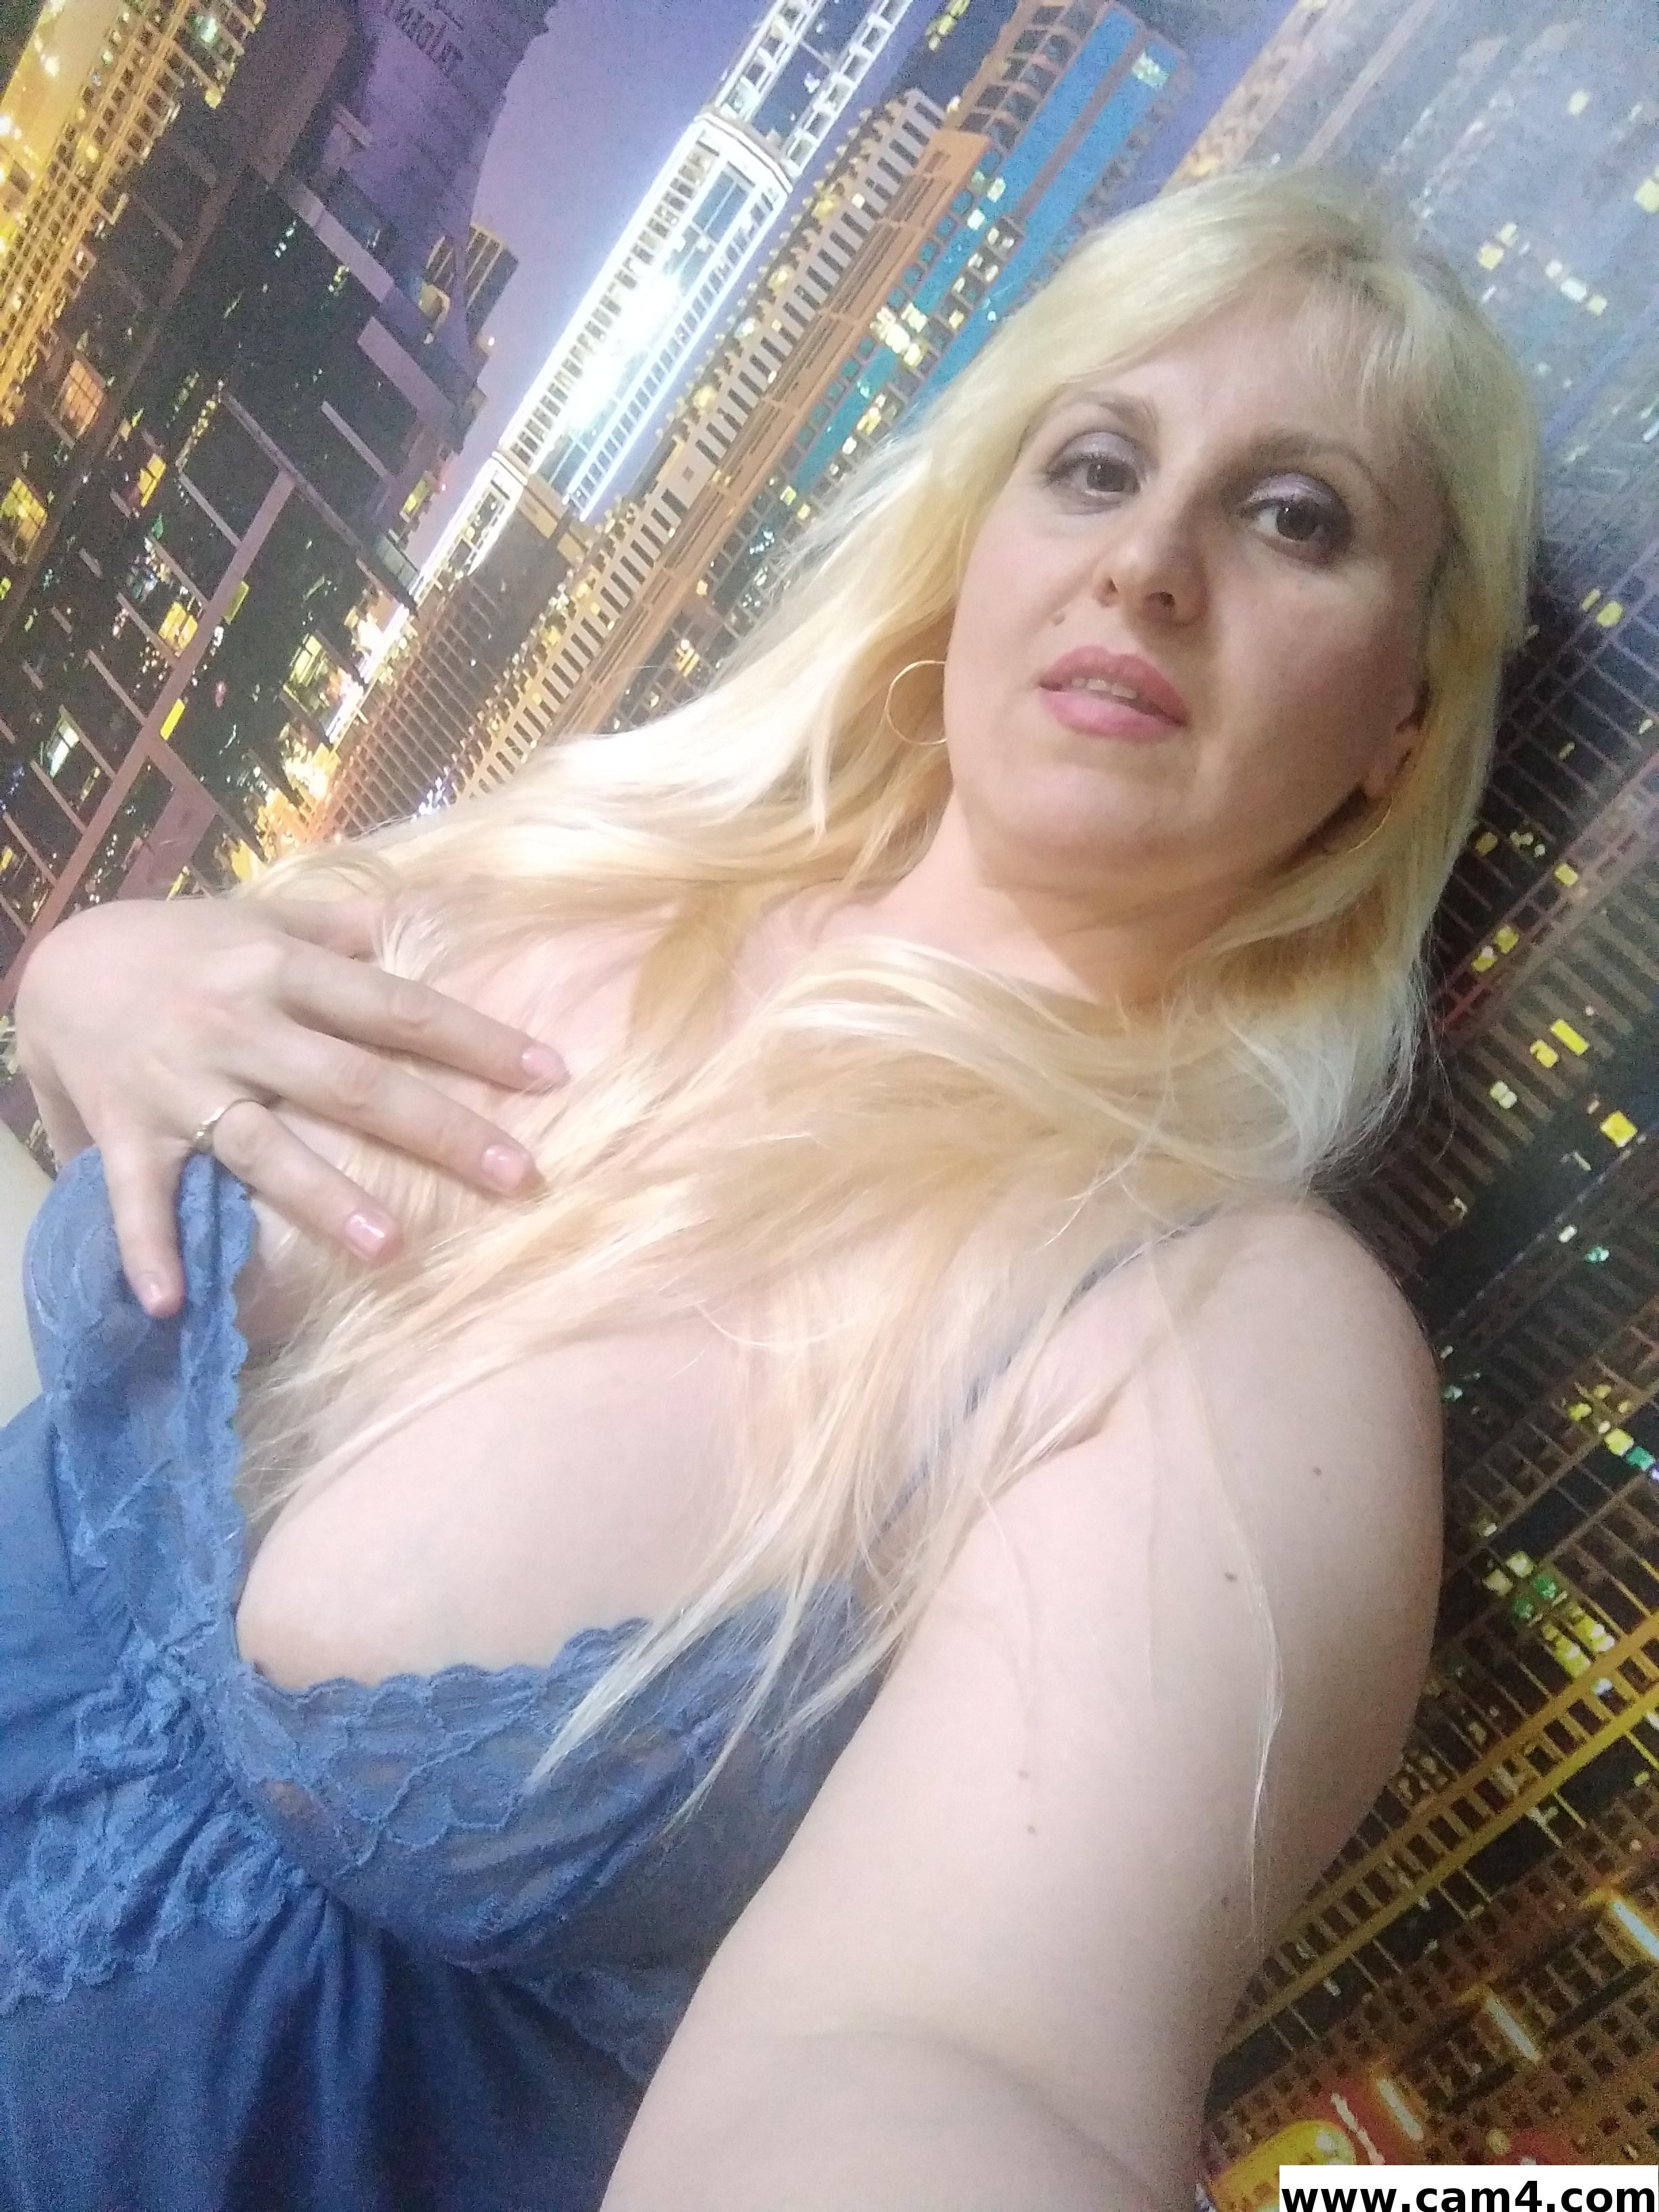 Blondabella?s=gtn7imn1ykyl3dhvecoqwi4l9kpkx3efuzjk6bc4ejw=